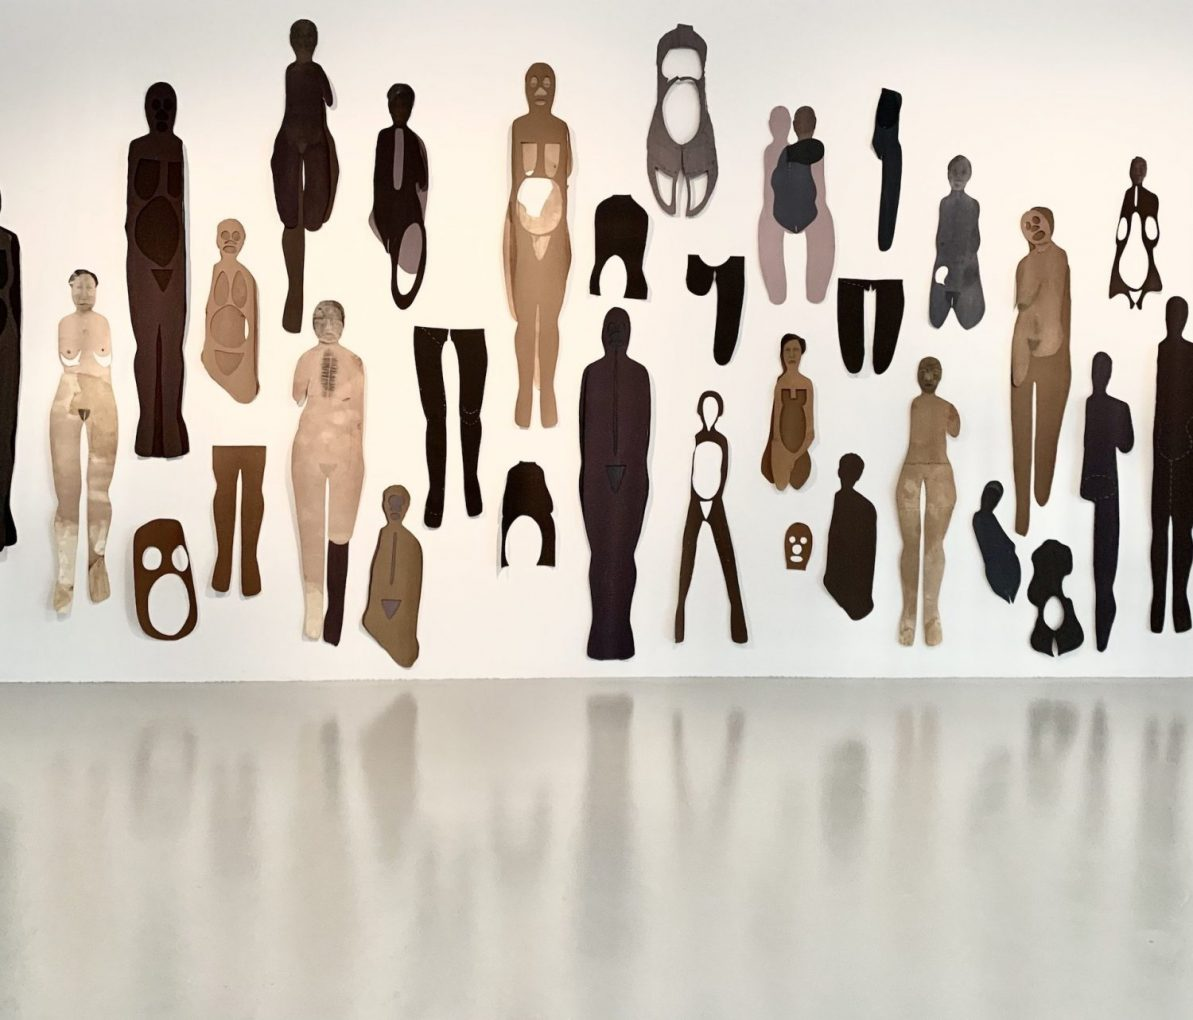 design miami Design Miami: Discover The Creatives Of Collectible Design NNM MDD FRAGMENTS scaled